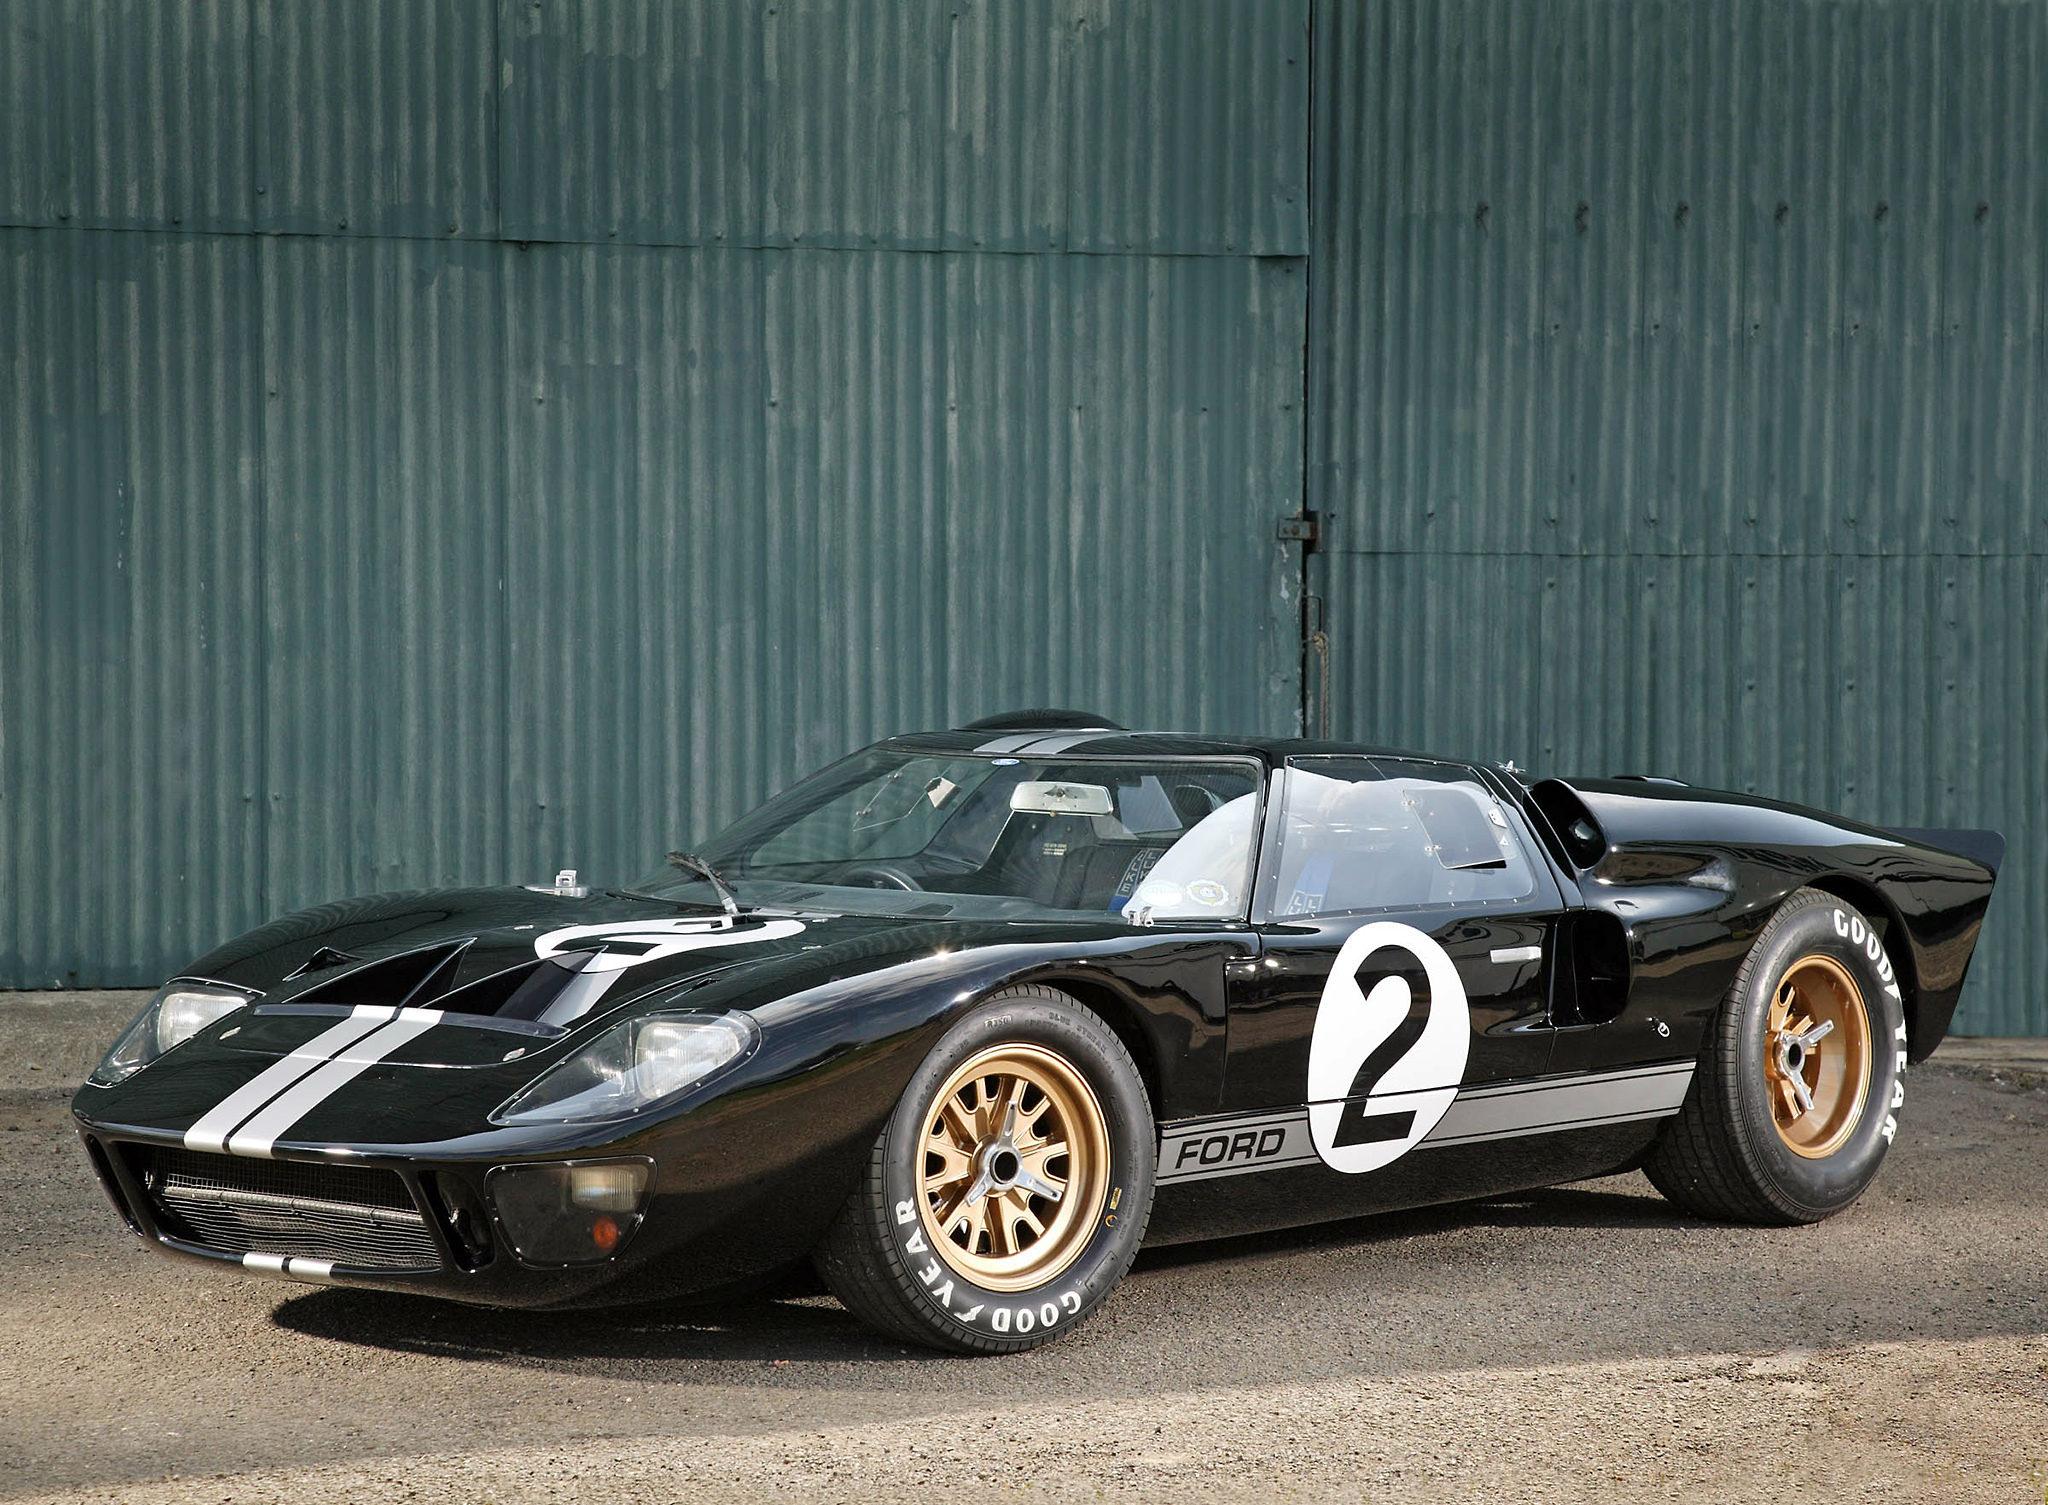 1966 Ford GT40 Le Mans Race Car